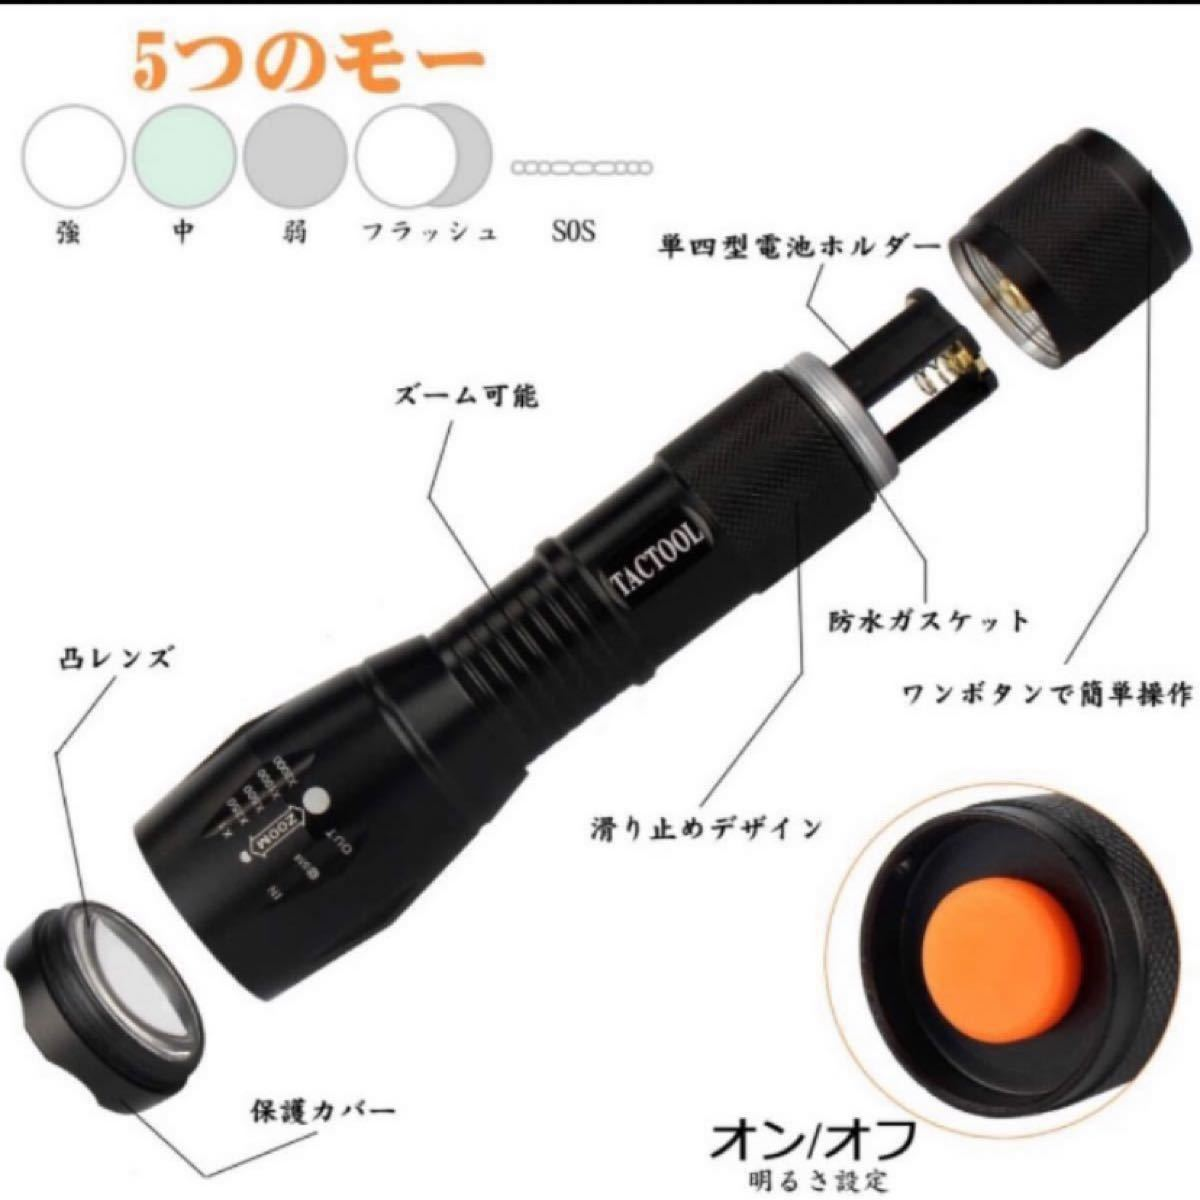 LED 懐中電灯 usb充電式 超高輝度 ハンディライト 小型